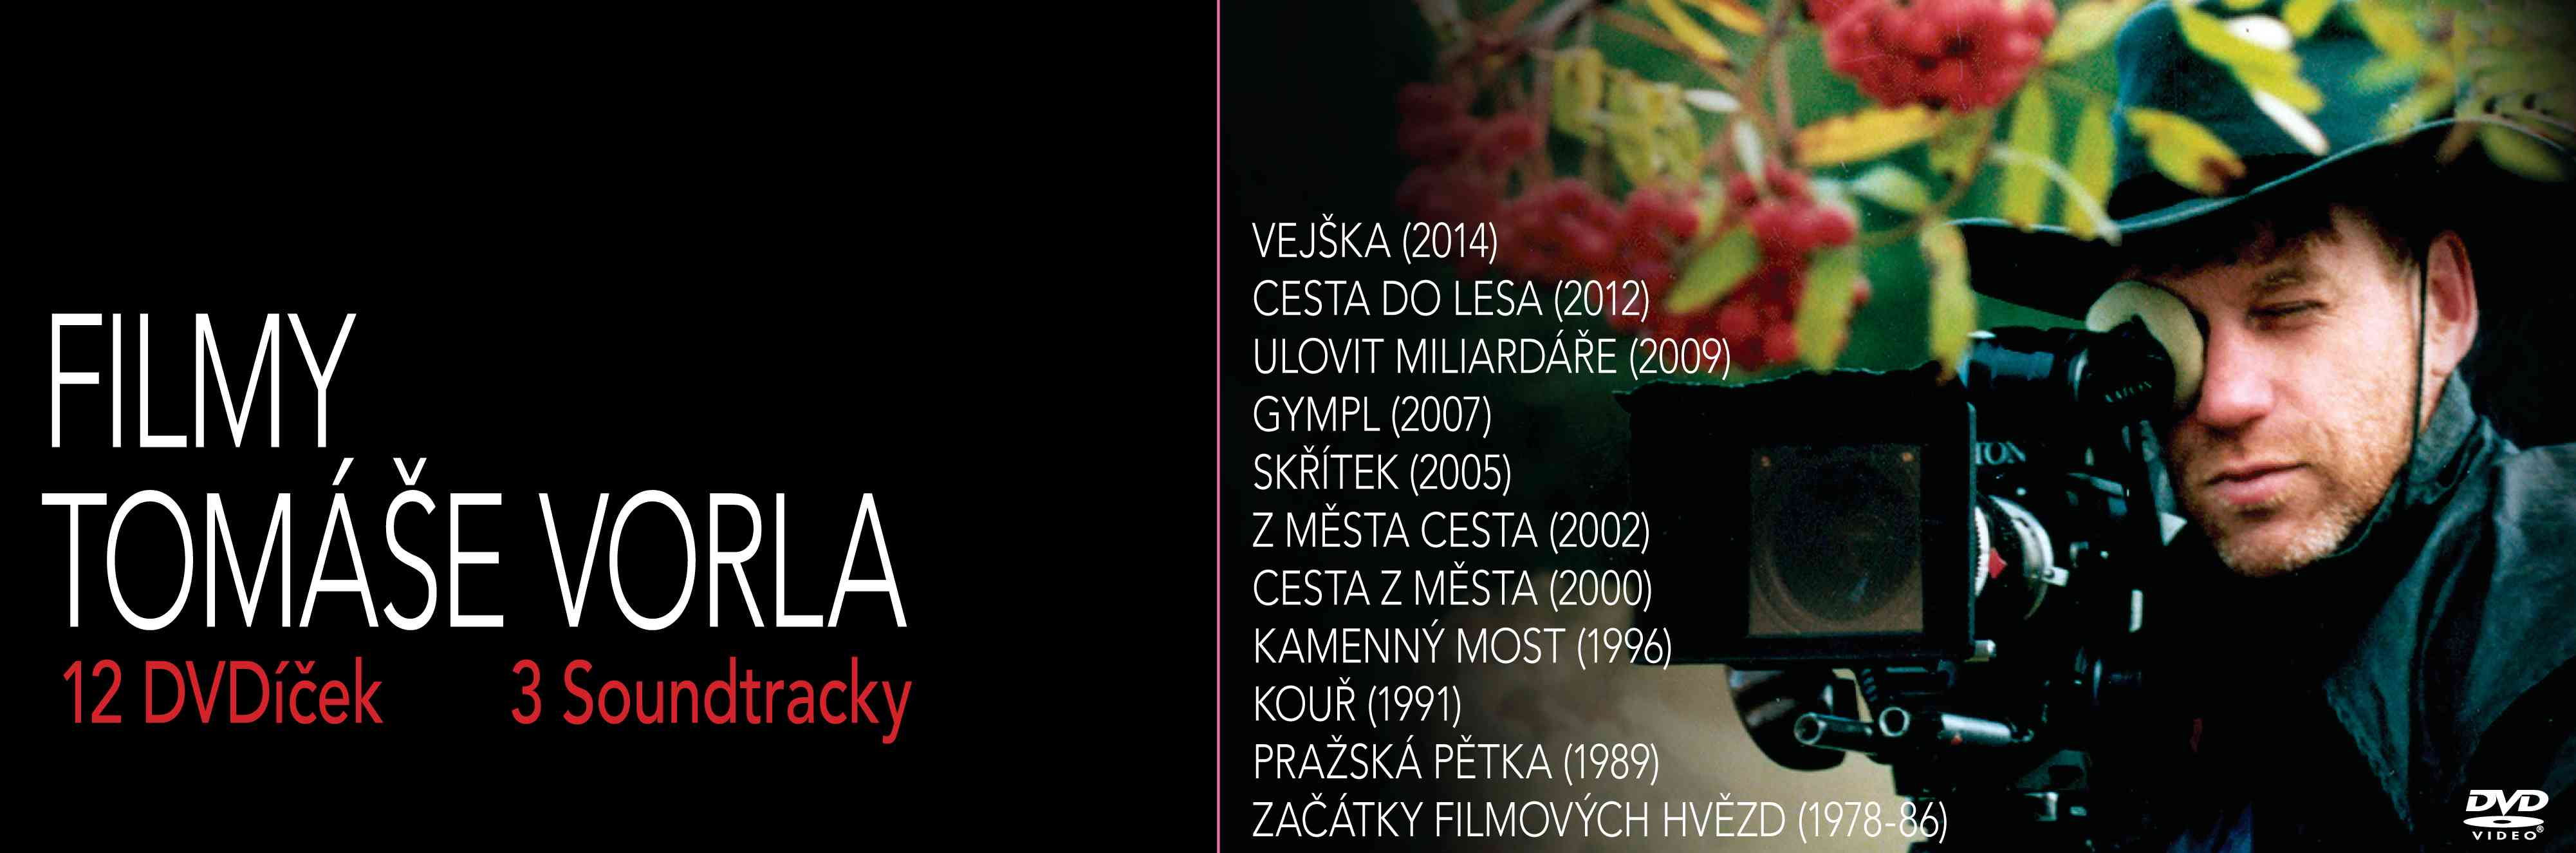 Kolekce DVD Filmy Tomase Vorla